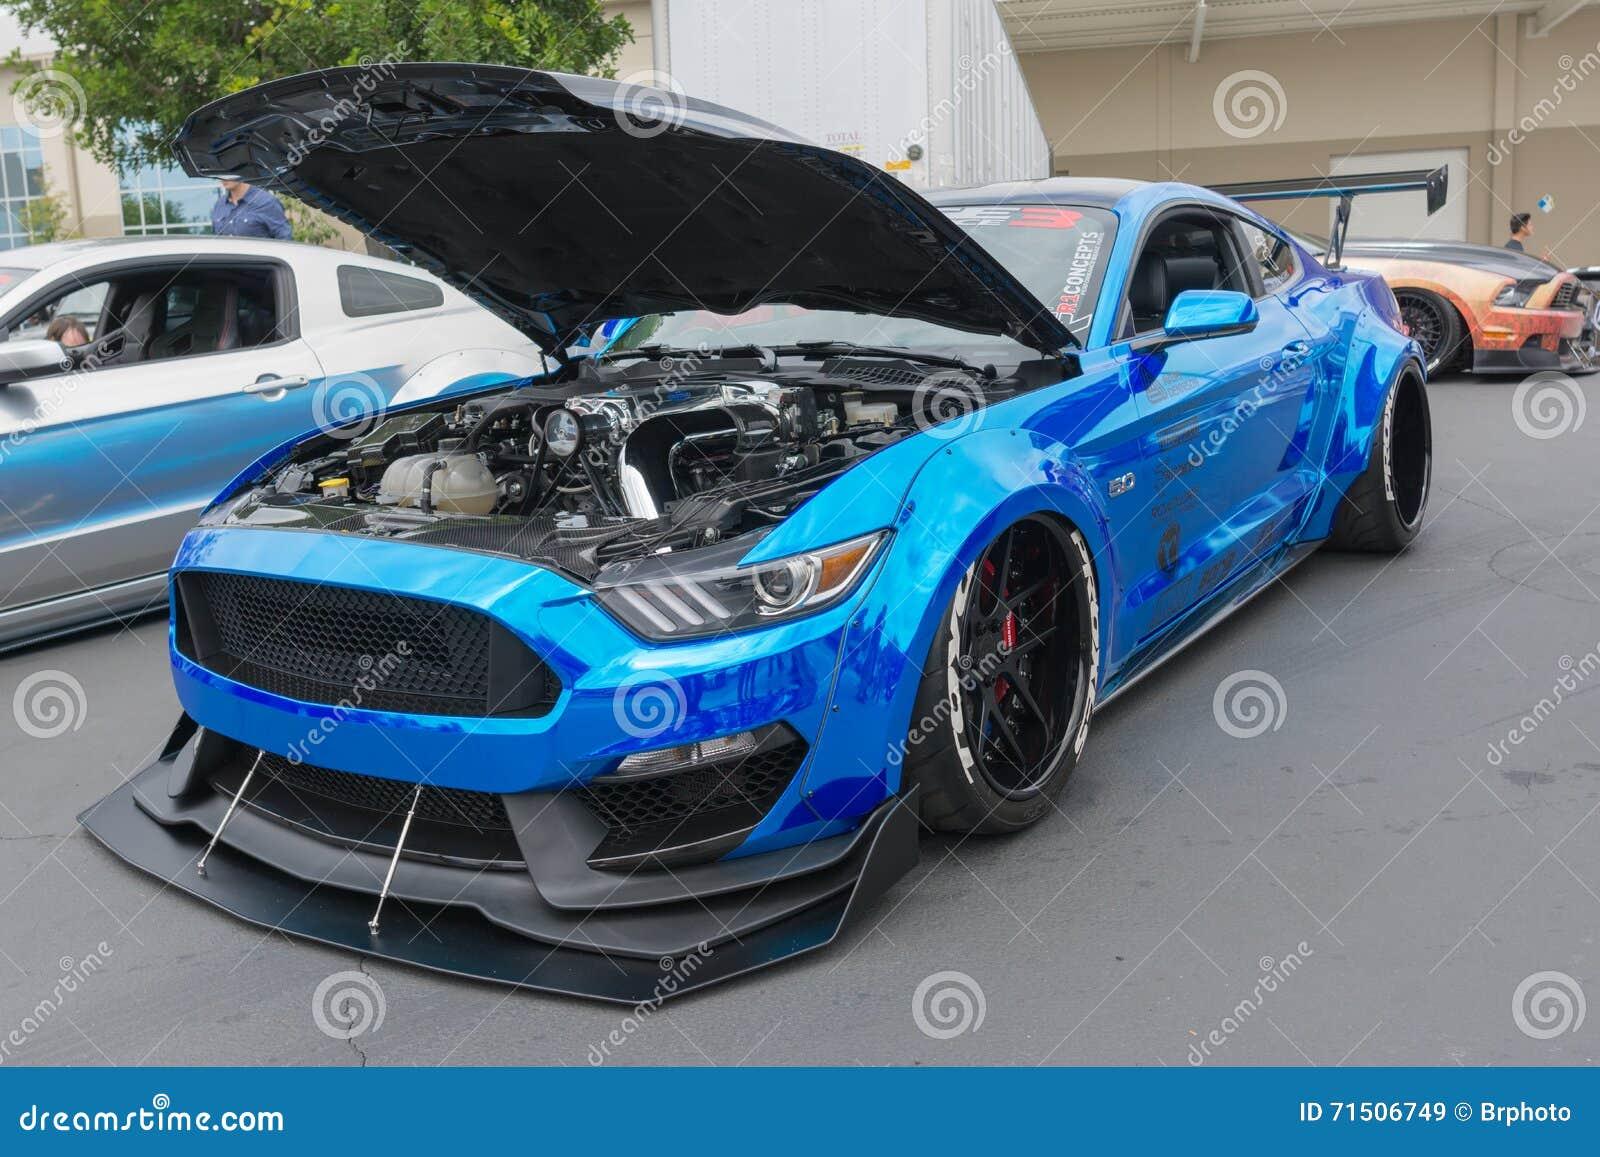 car ... & Modified Ford Mustang Editorial Stock Image - Image: 71506749 markmcfarlin.com